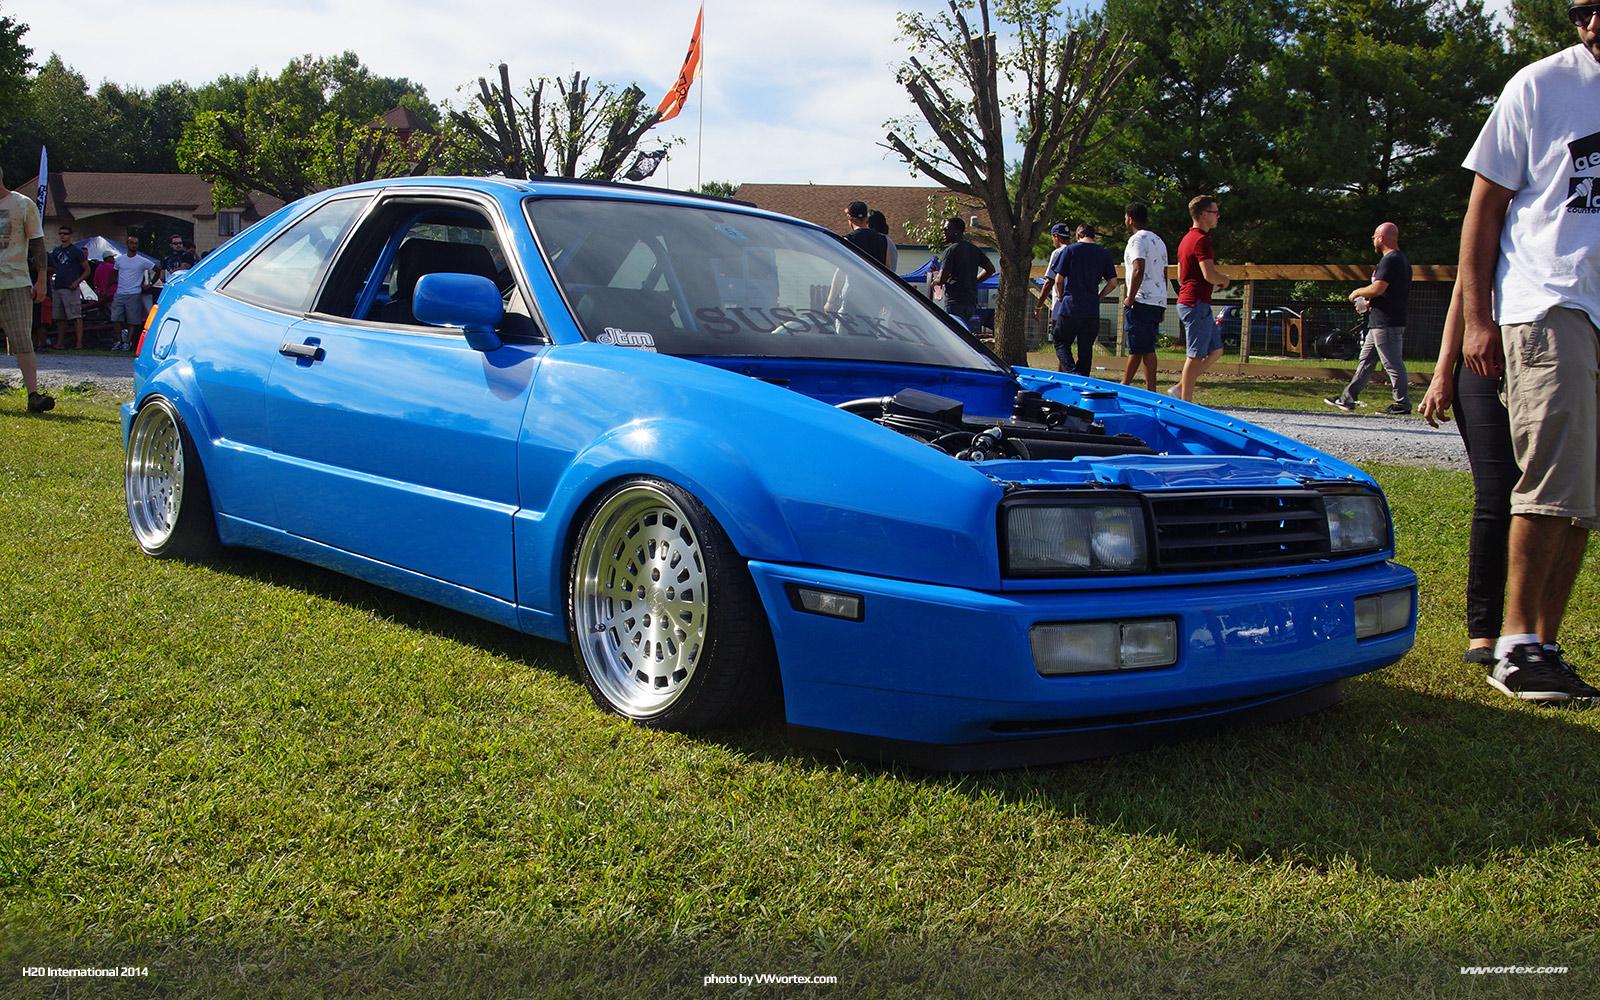 2014-H20i-H20-International-VW-Volkswagen-Audi-1109